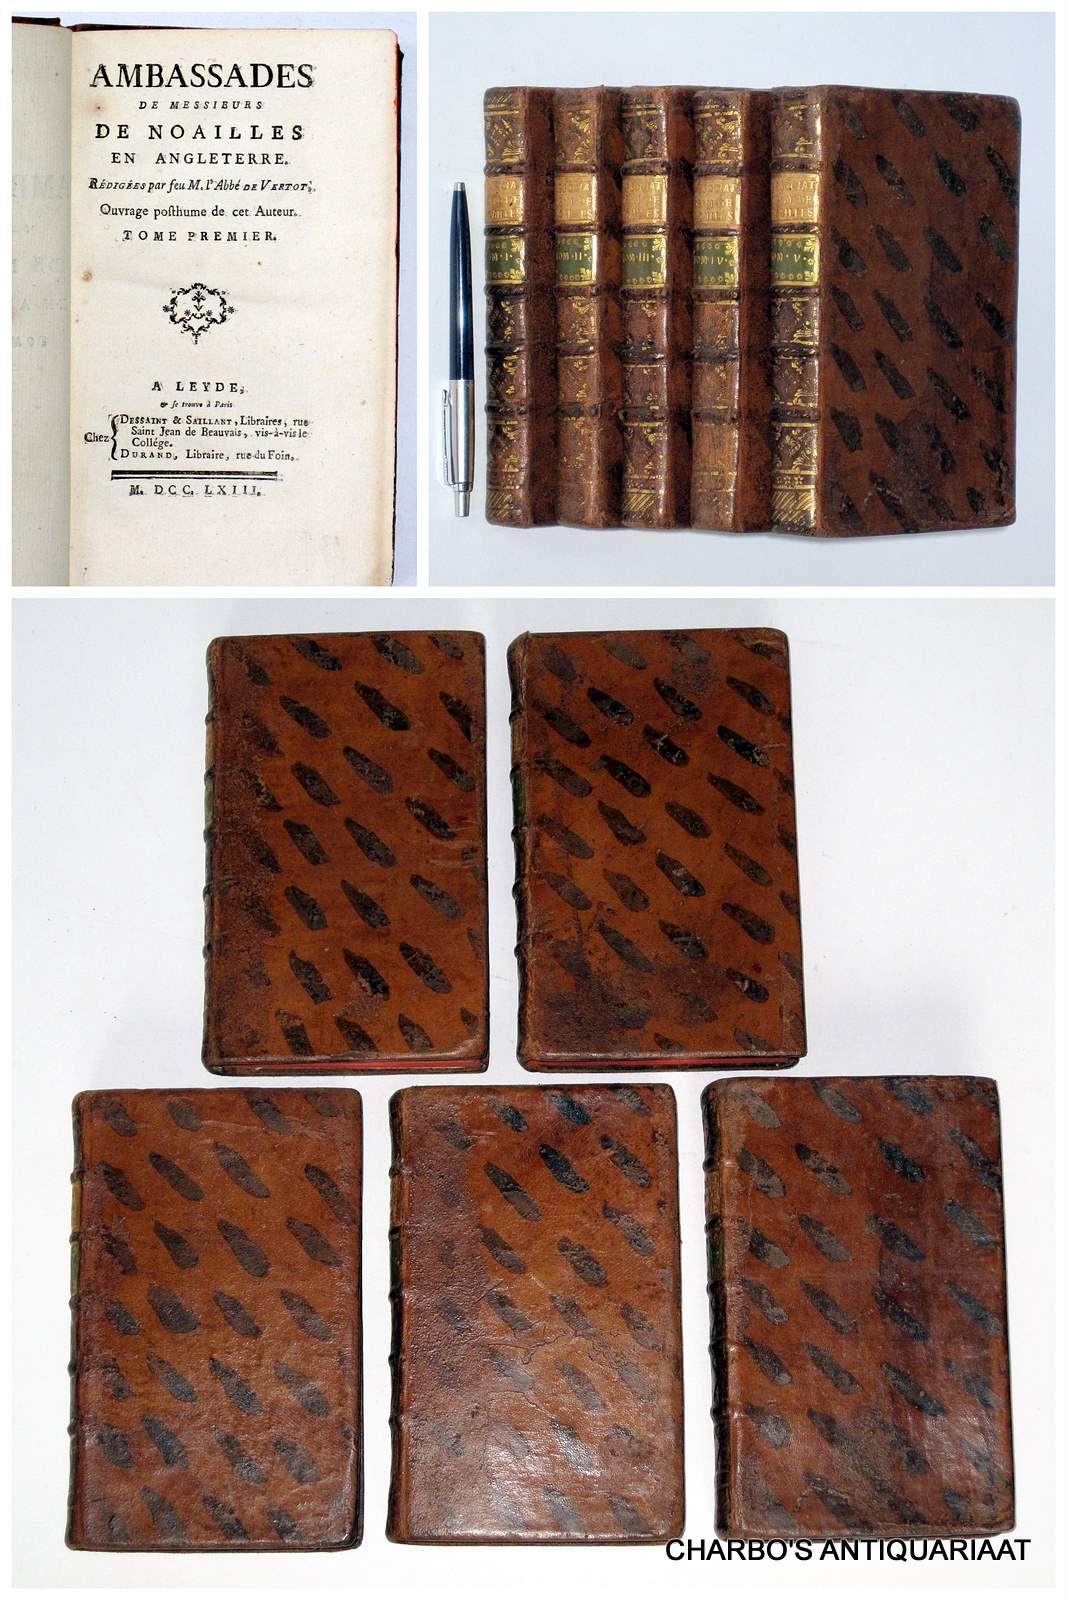 VERTOT, ABBÉ DE, -  Ambassades de messieurs de Noailles en Angleterre. Redigees par feu M. l'Abbé de Vertot. Ouvrage posthume de cet auteur. (5 vols.).